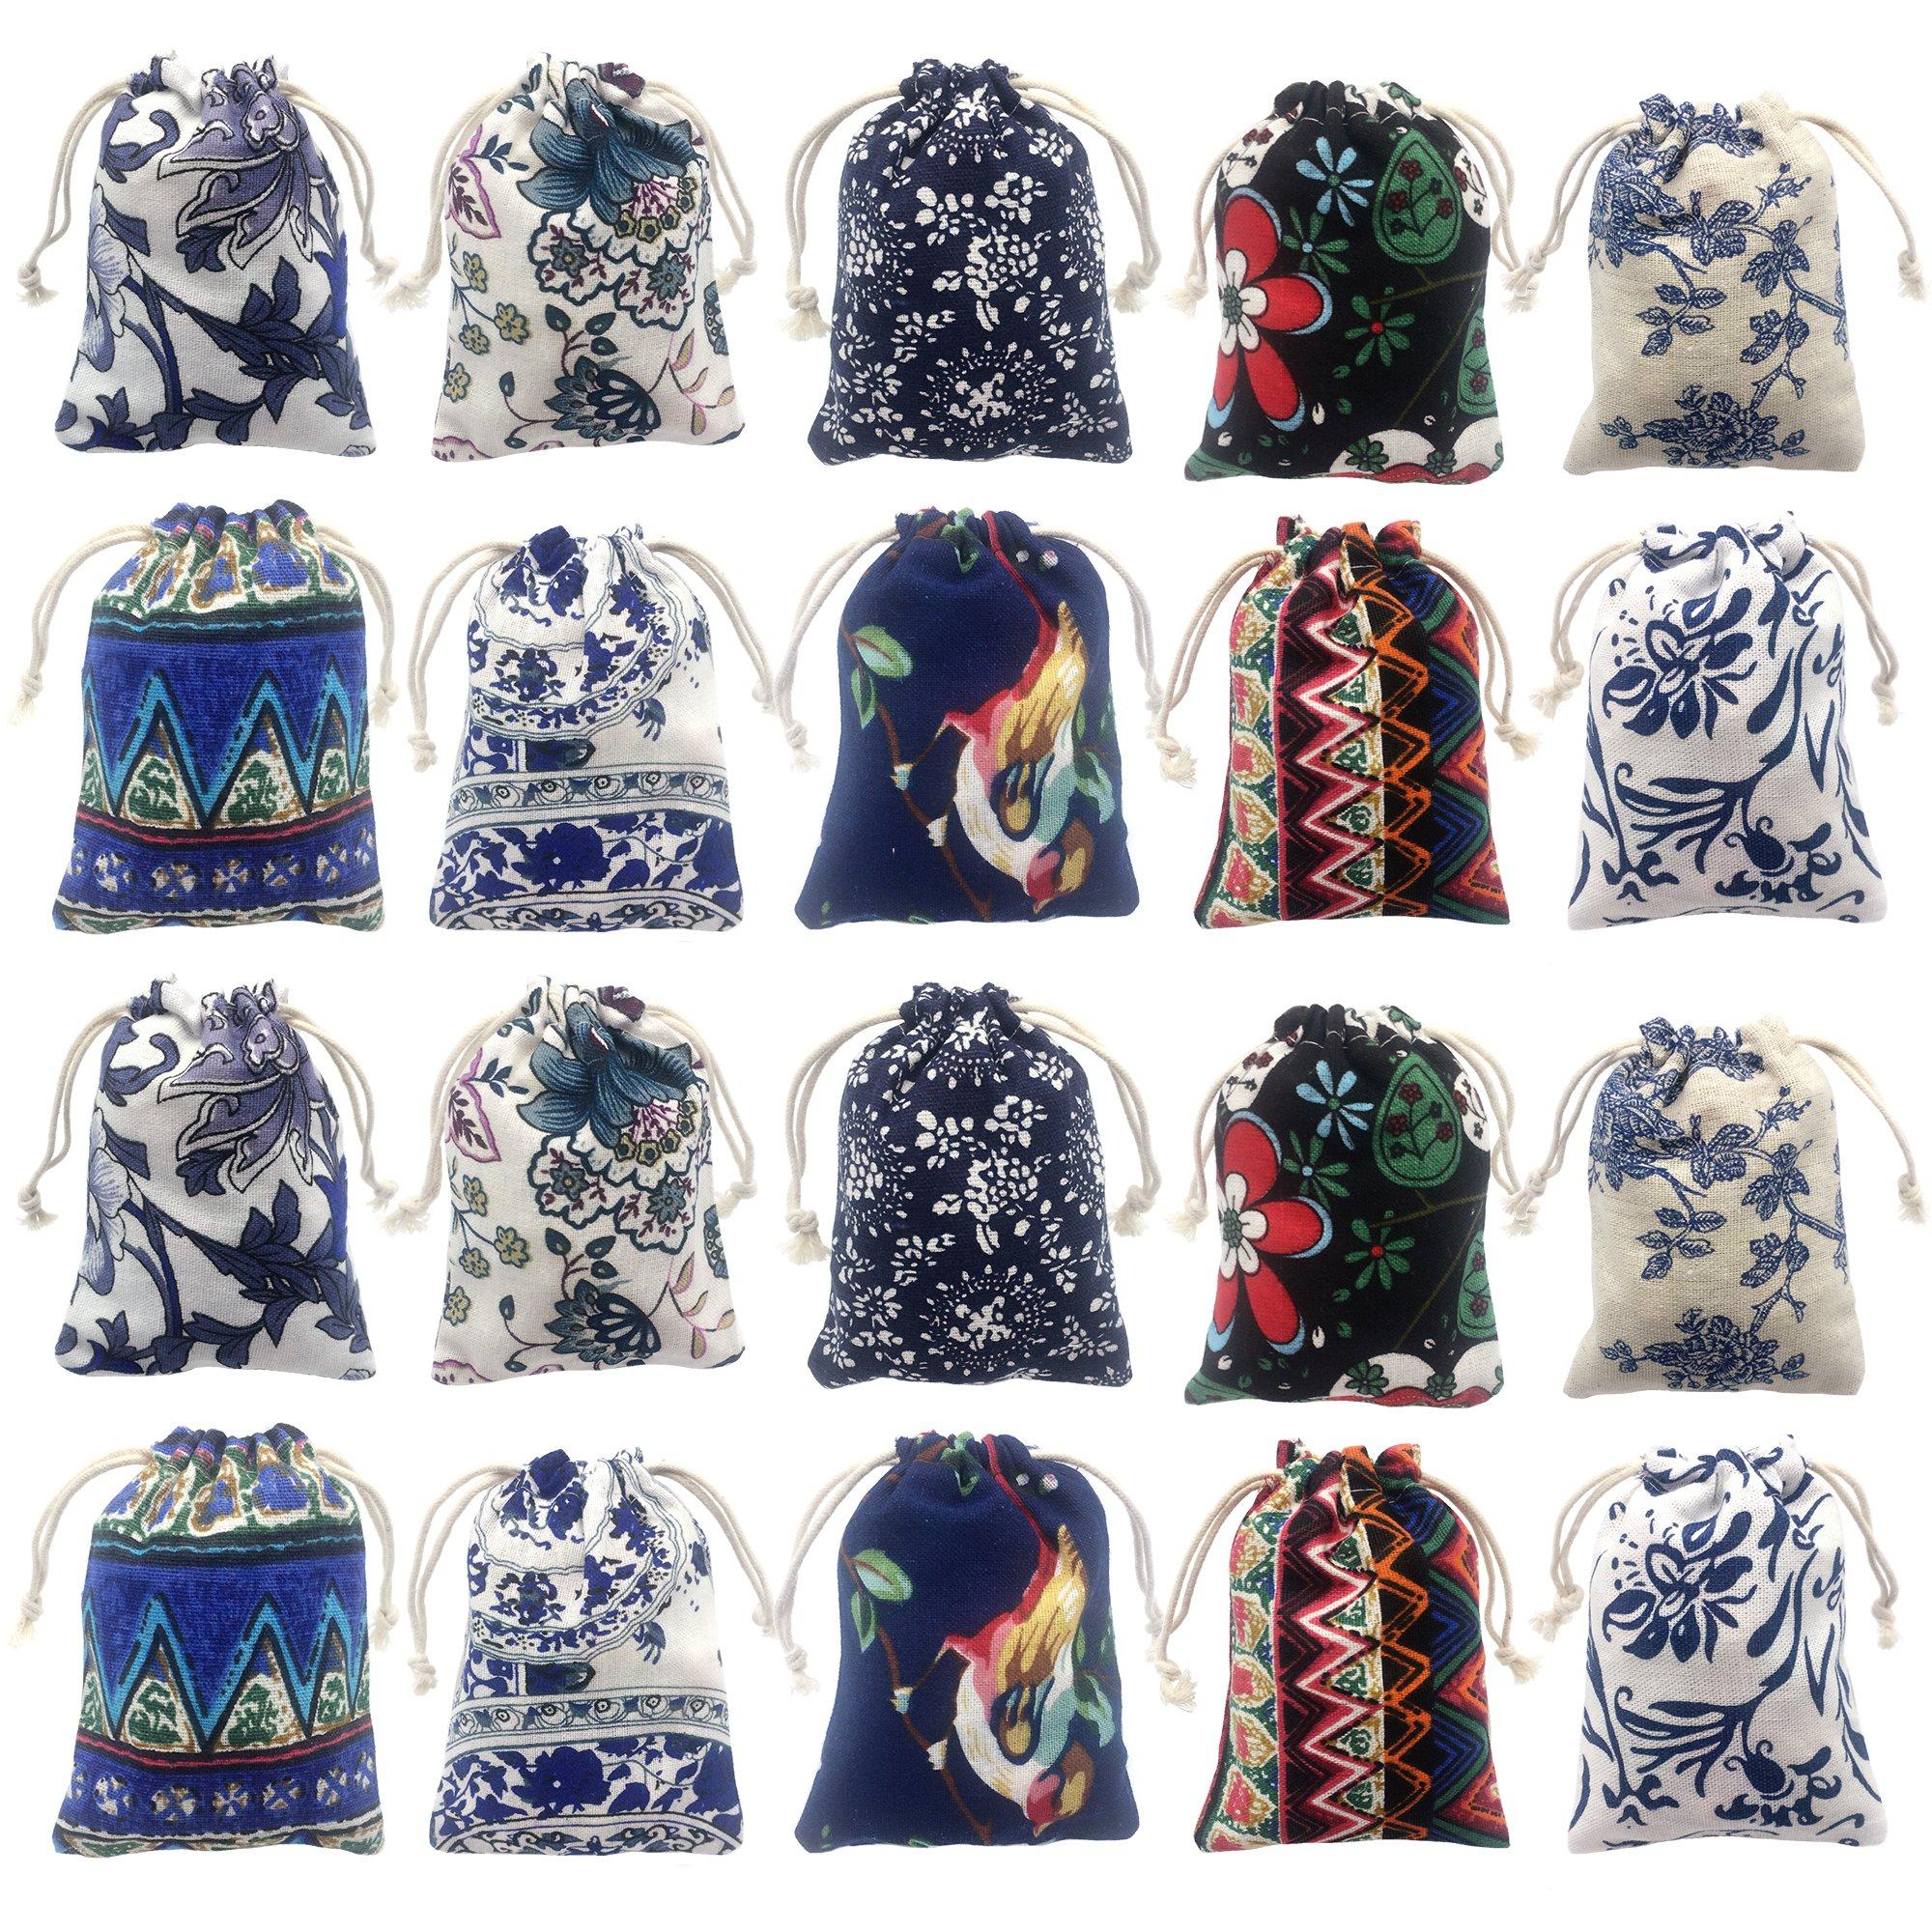 Elesa Miracle 20pcs Retro Cotton Canvas Jewelry Pouch Bag, Drawstring Coin Purse, Gift Bag Value Set